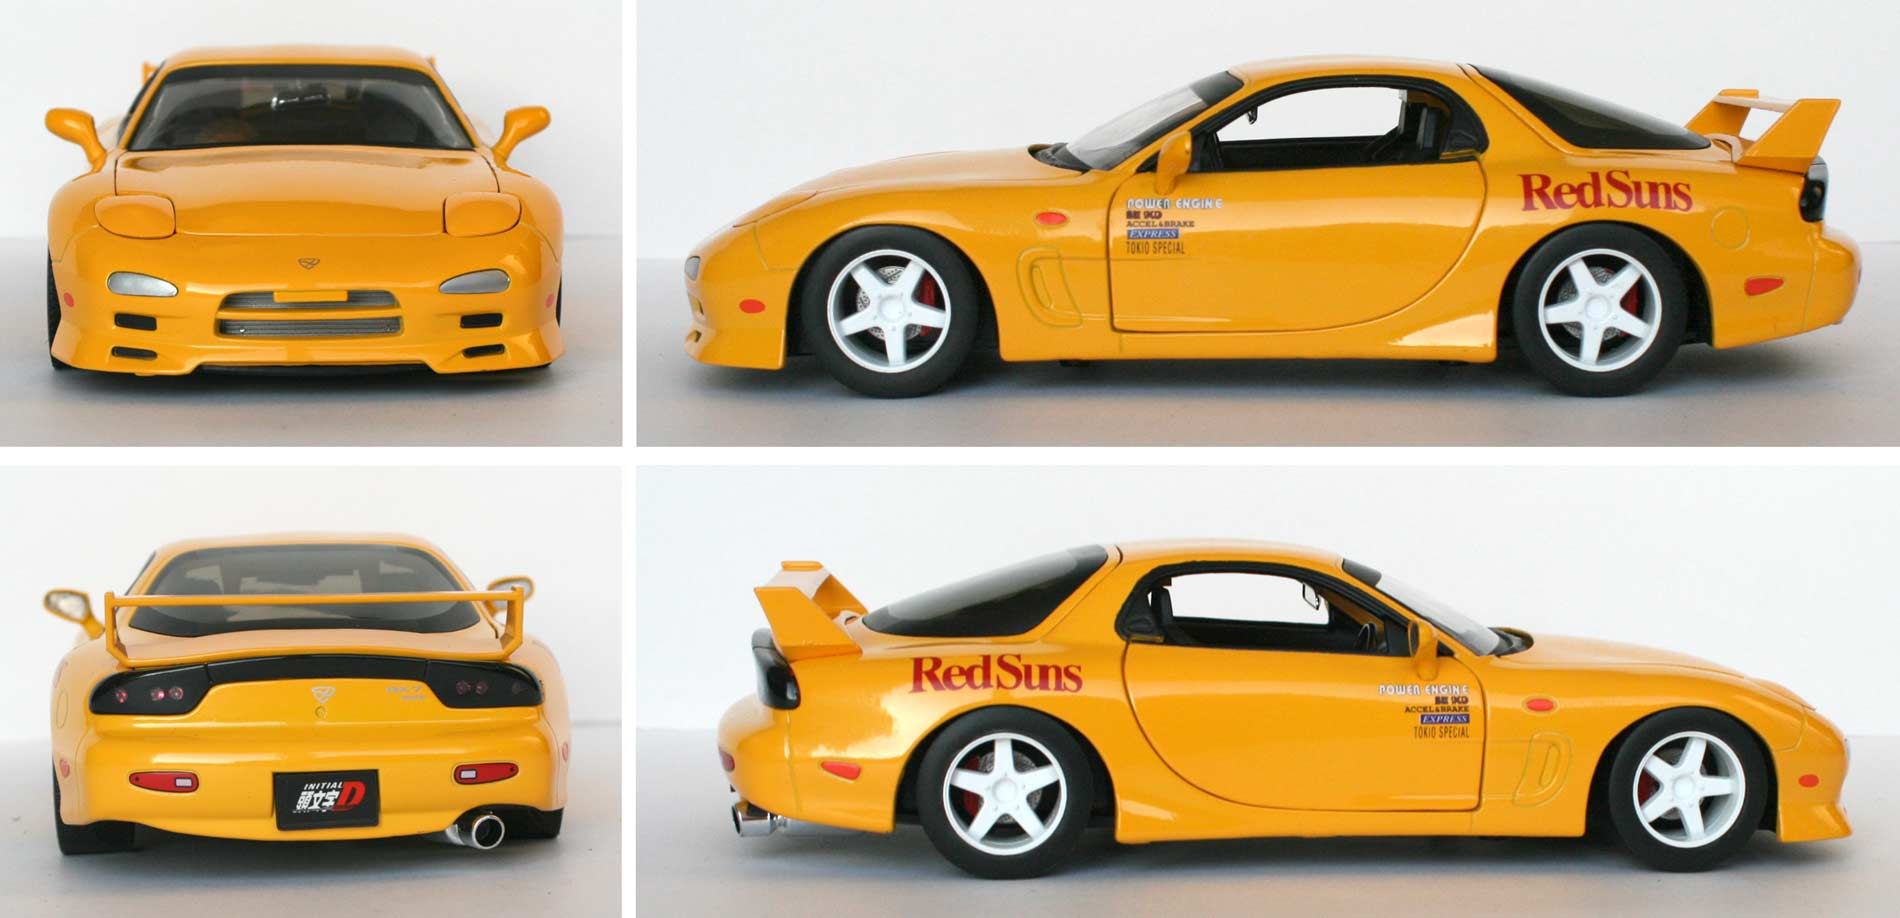 Initial D : Mazda RX 7 FD3S – ech 1/18 (Jada Toys) Initial D : Mazda RX 7 FD3S - ech 1/18 (Jada Toys) - Turn over – Otakia » Tests et ...